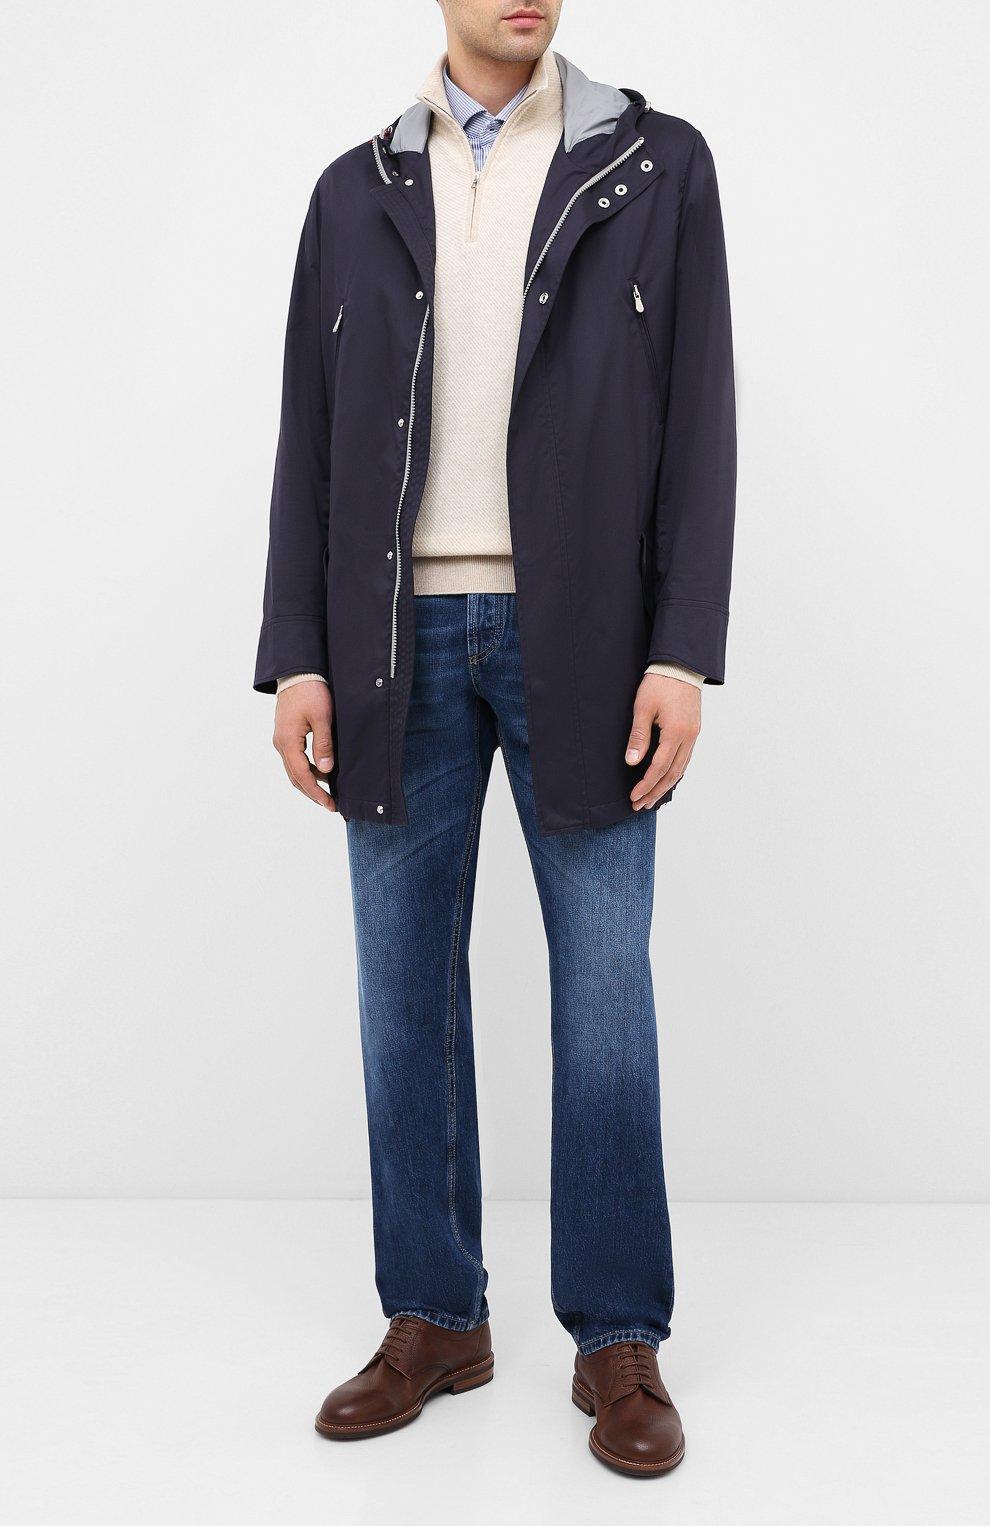 Мужские джинсы BRUNELLO CUCINELLI синего цвета, арт. ME228D2220 | Фото 2